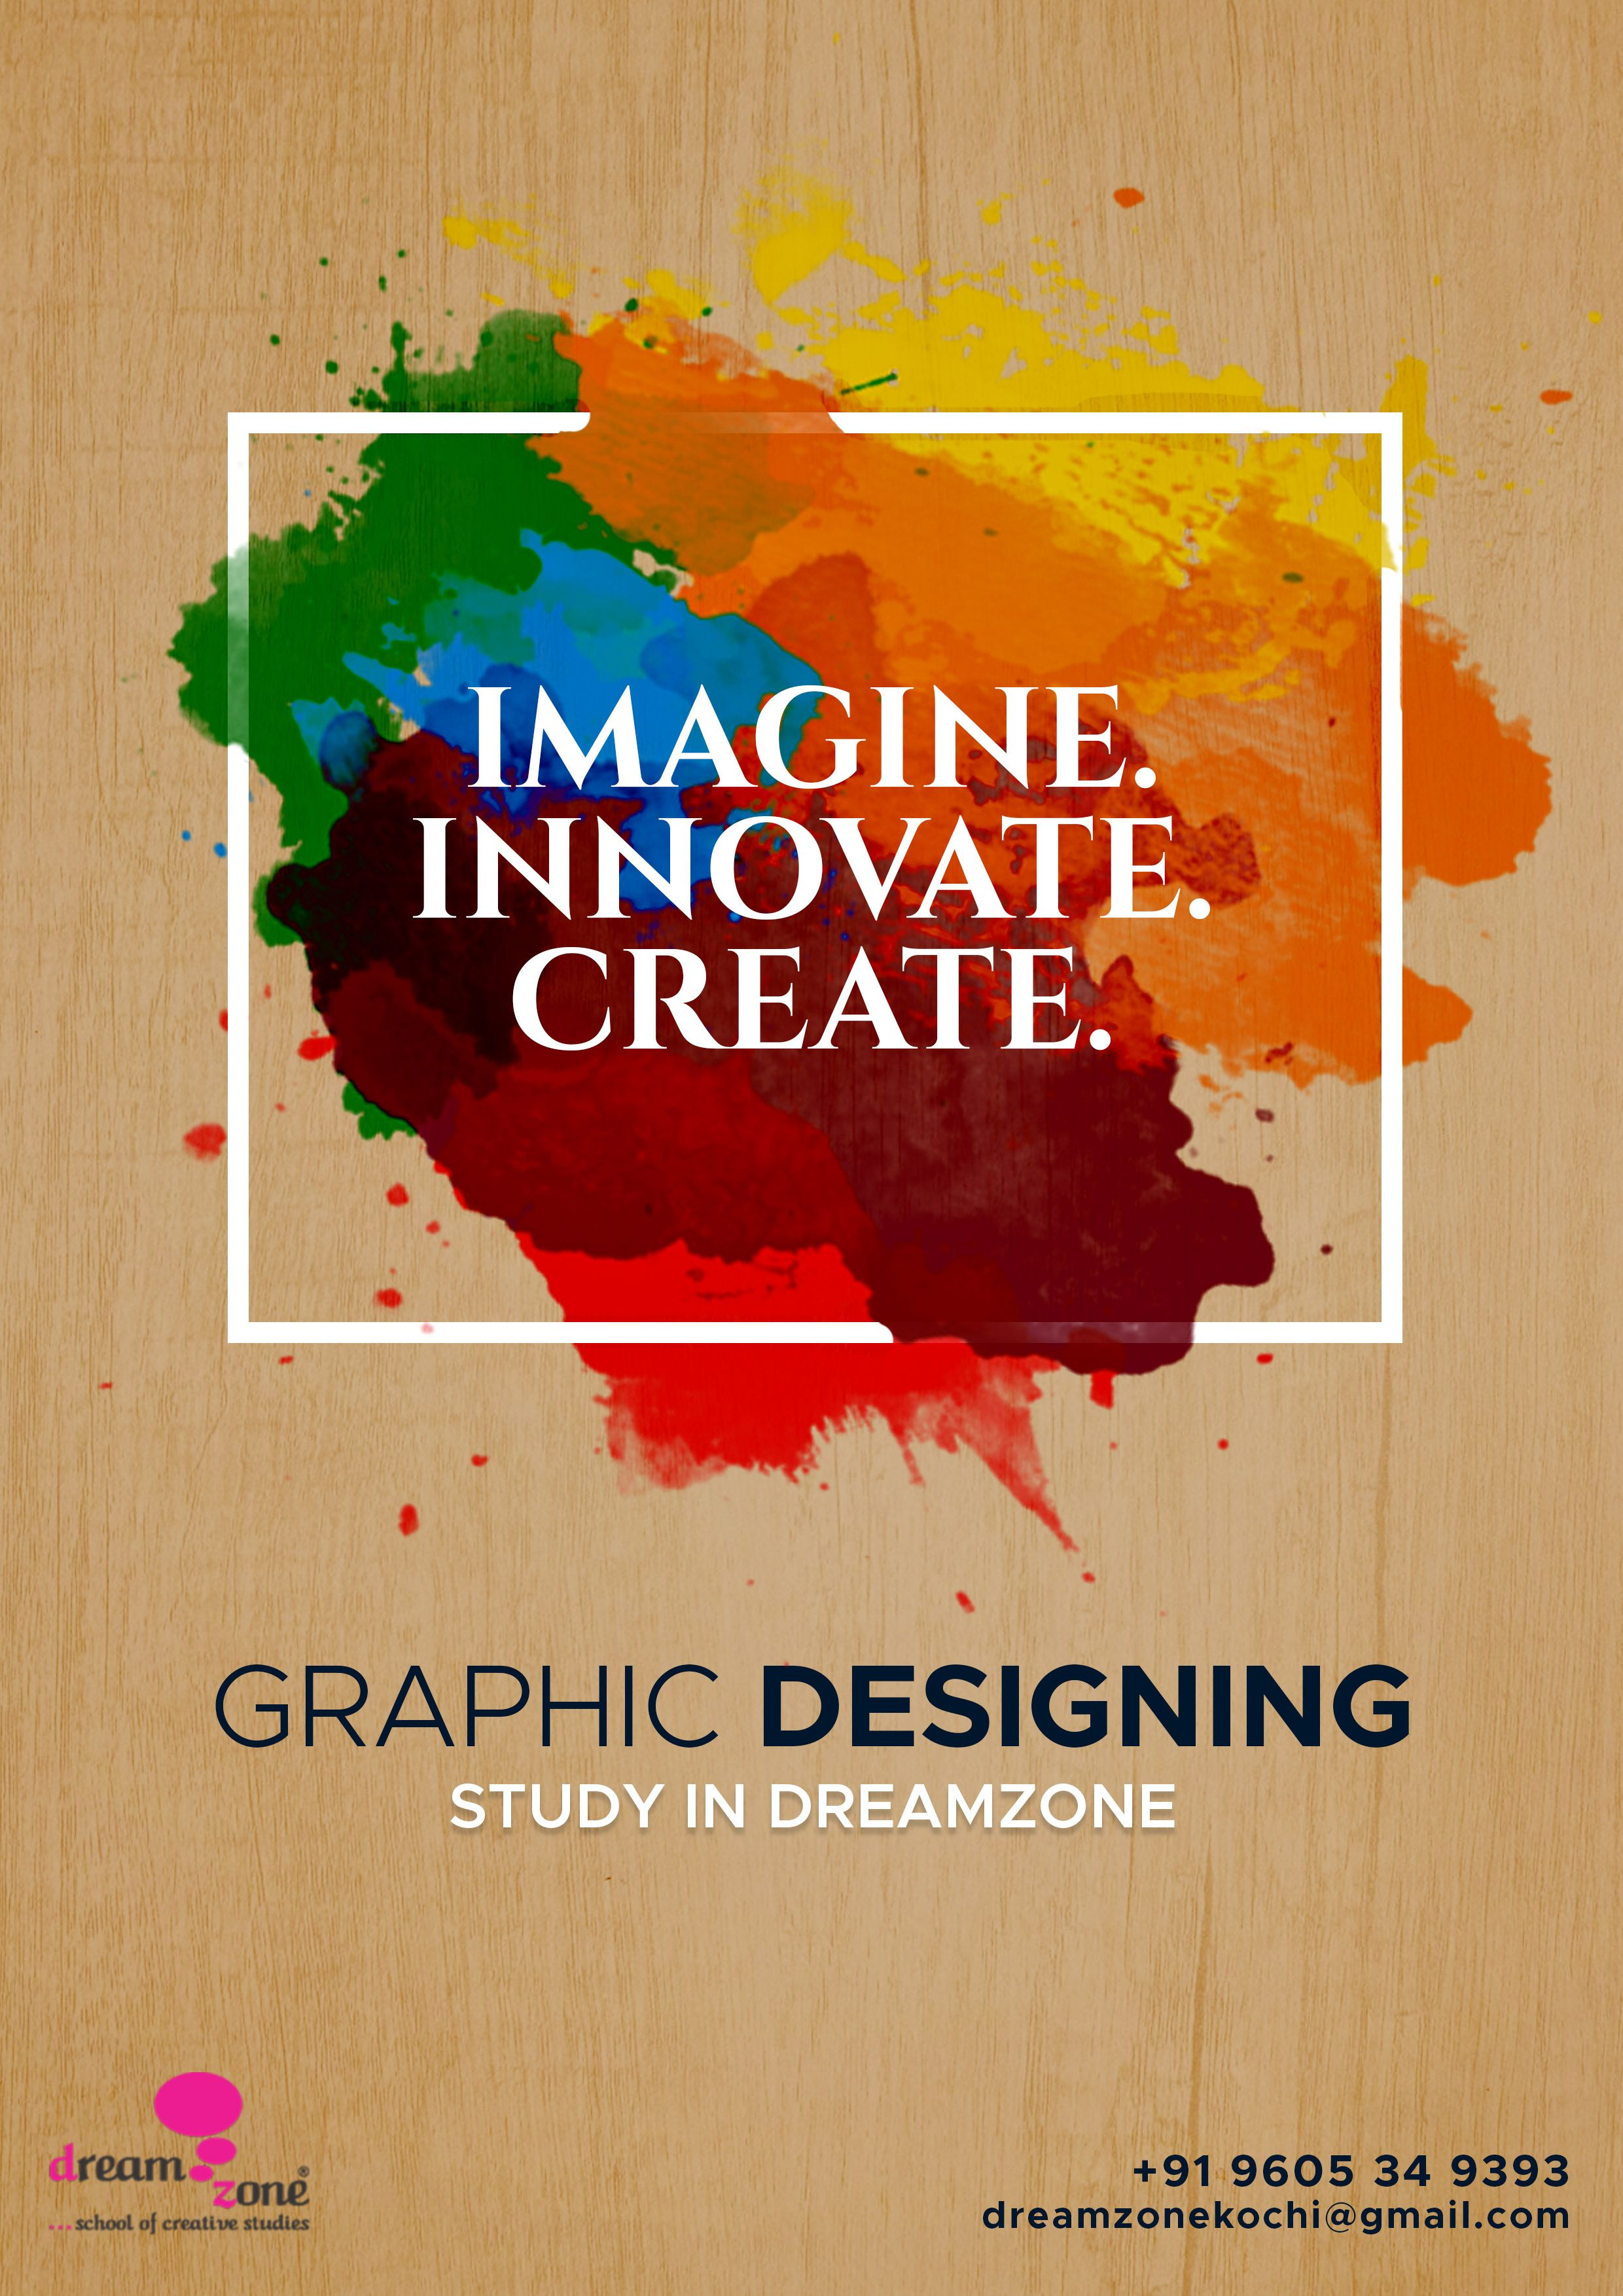 Graphic Design Courses In Kochi Graphic Design Jobs Graphic Design Course Graphic Design